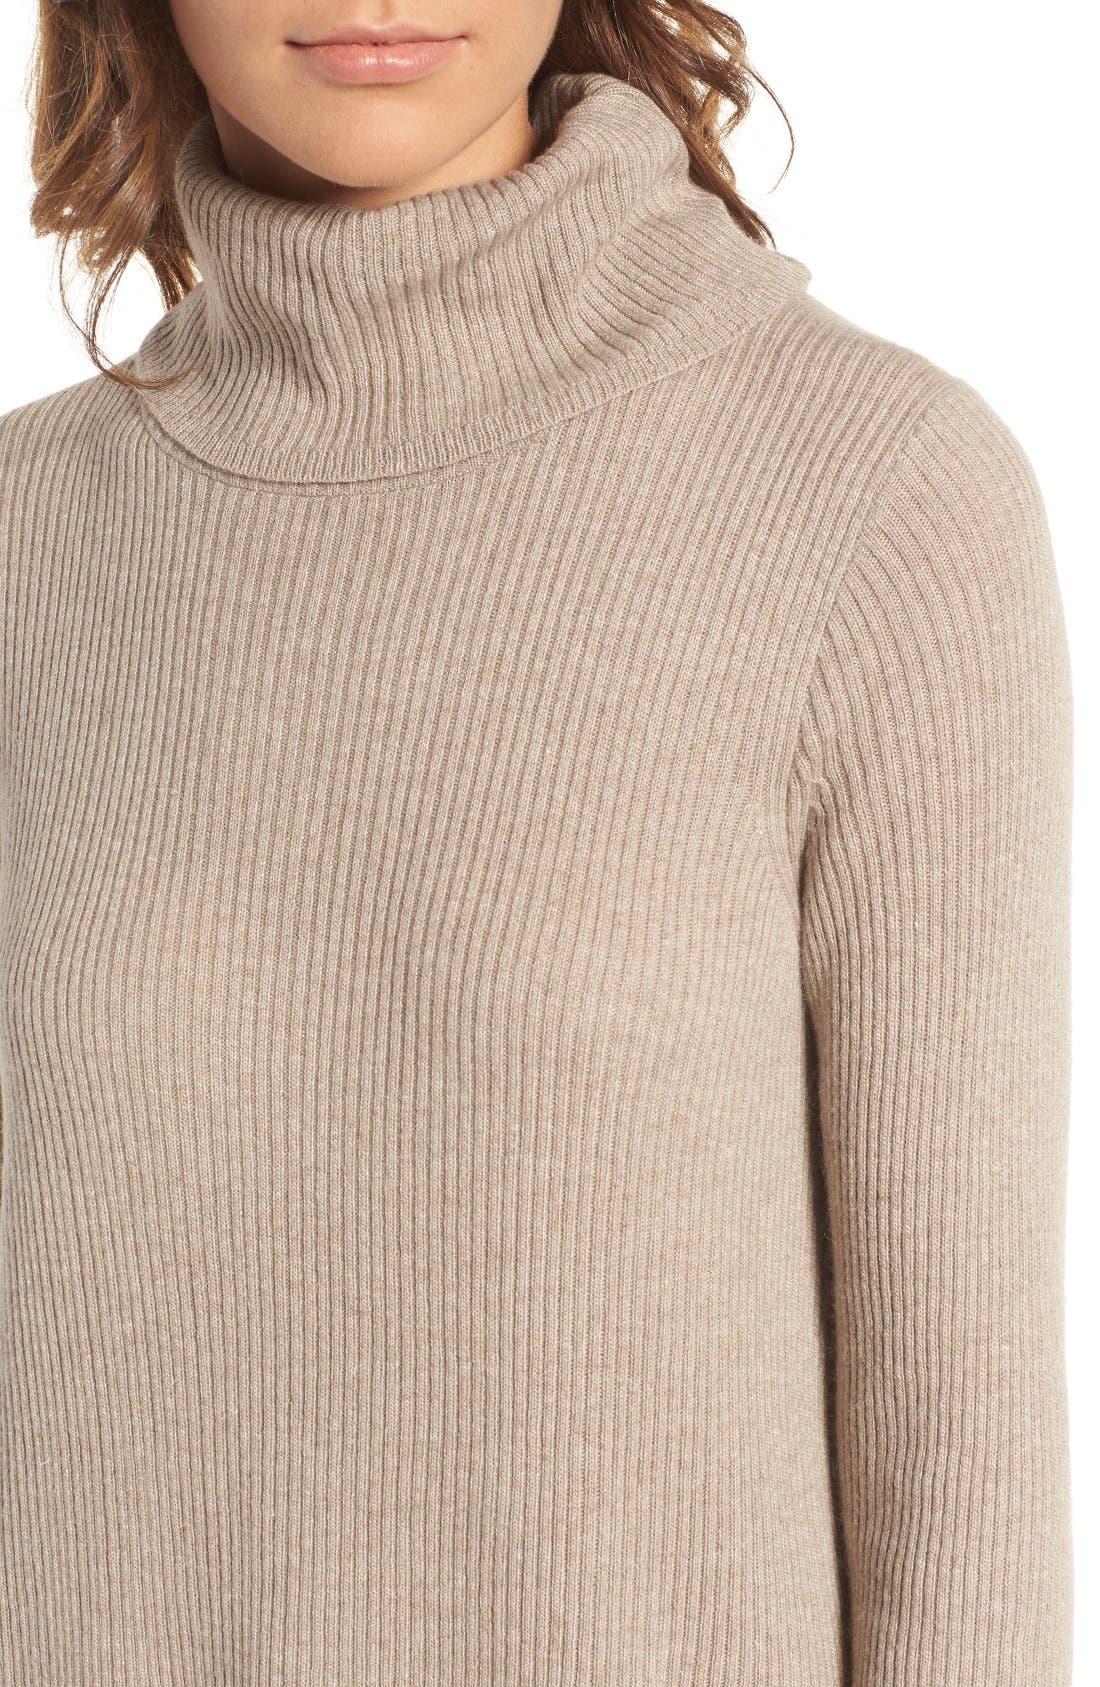 Turtleneck Sweater Dress,                             Alternate thumbnail 4, color,                             Heather Hazelwood